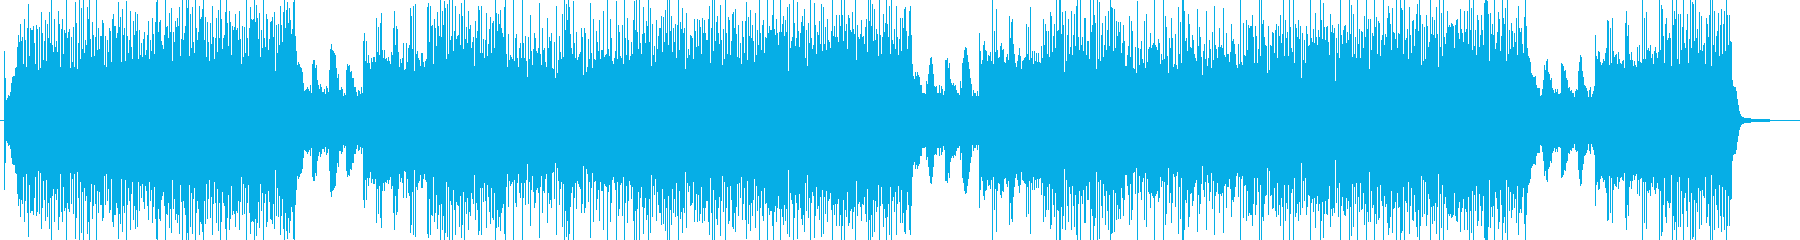 「HR/HM」「ROCK」BGM203の再生済みの波形